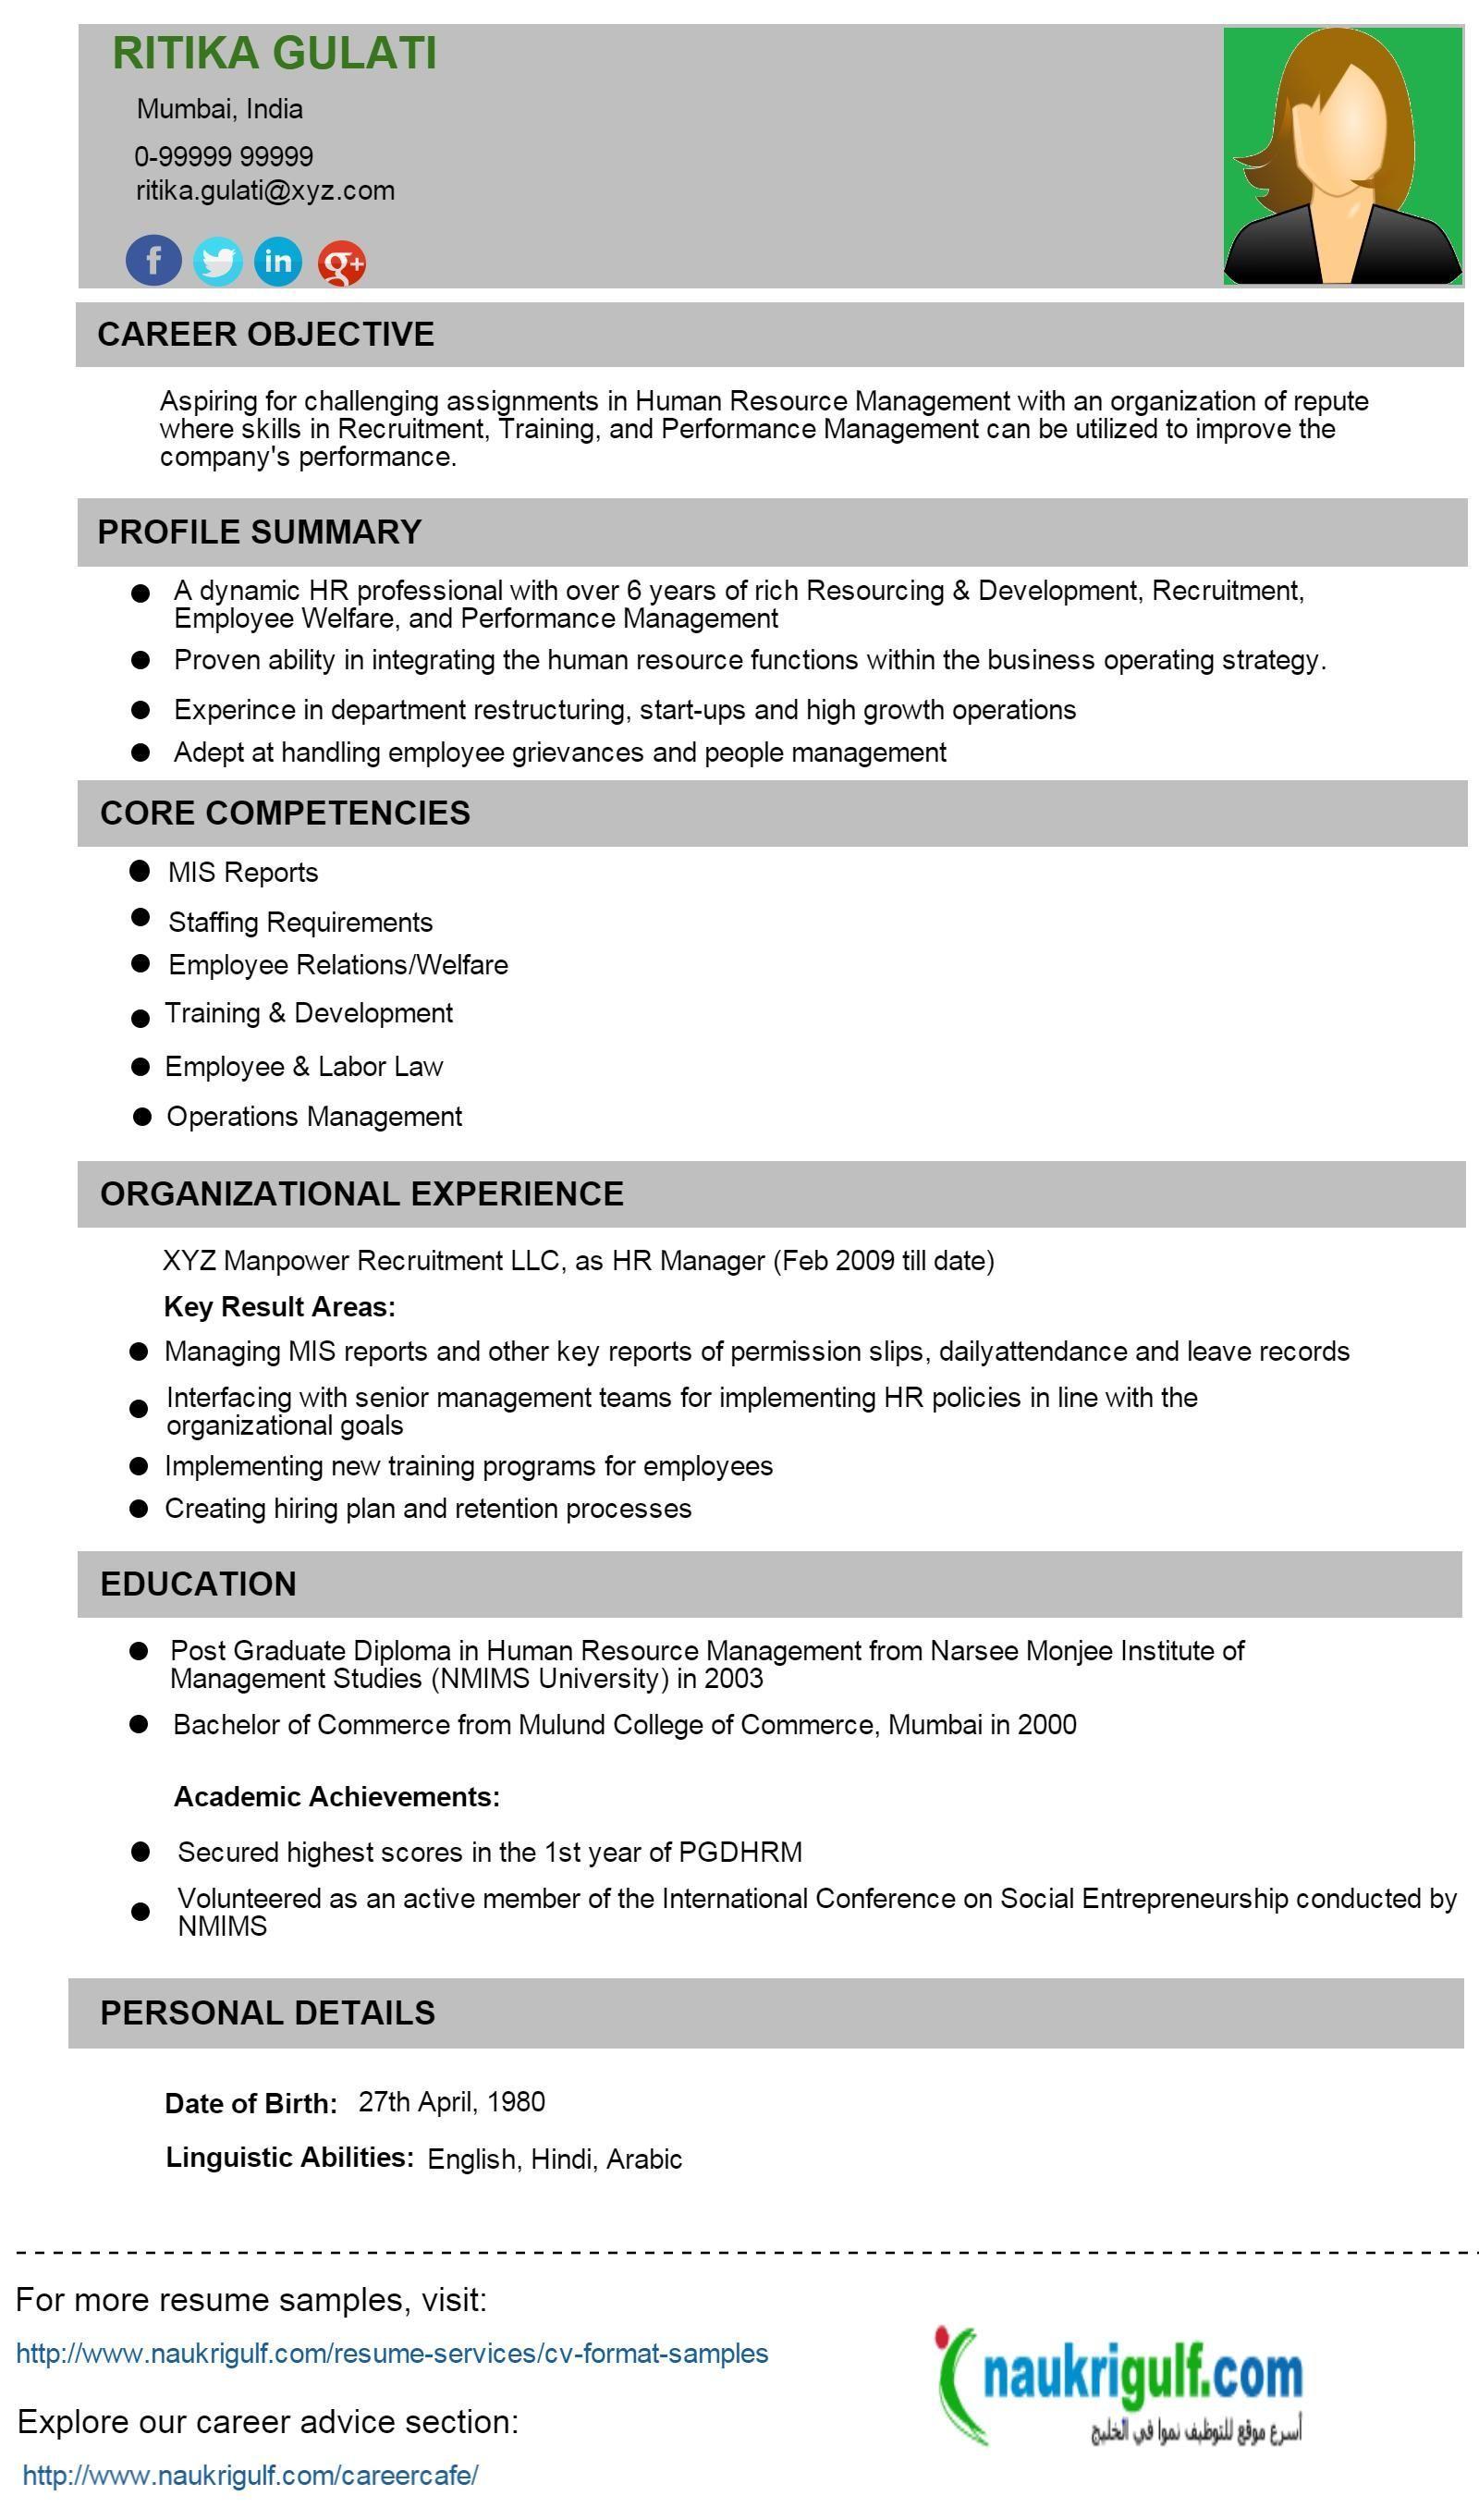 Resume Format Uae 2 Resume Format Pinterest Resume Format